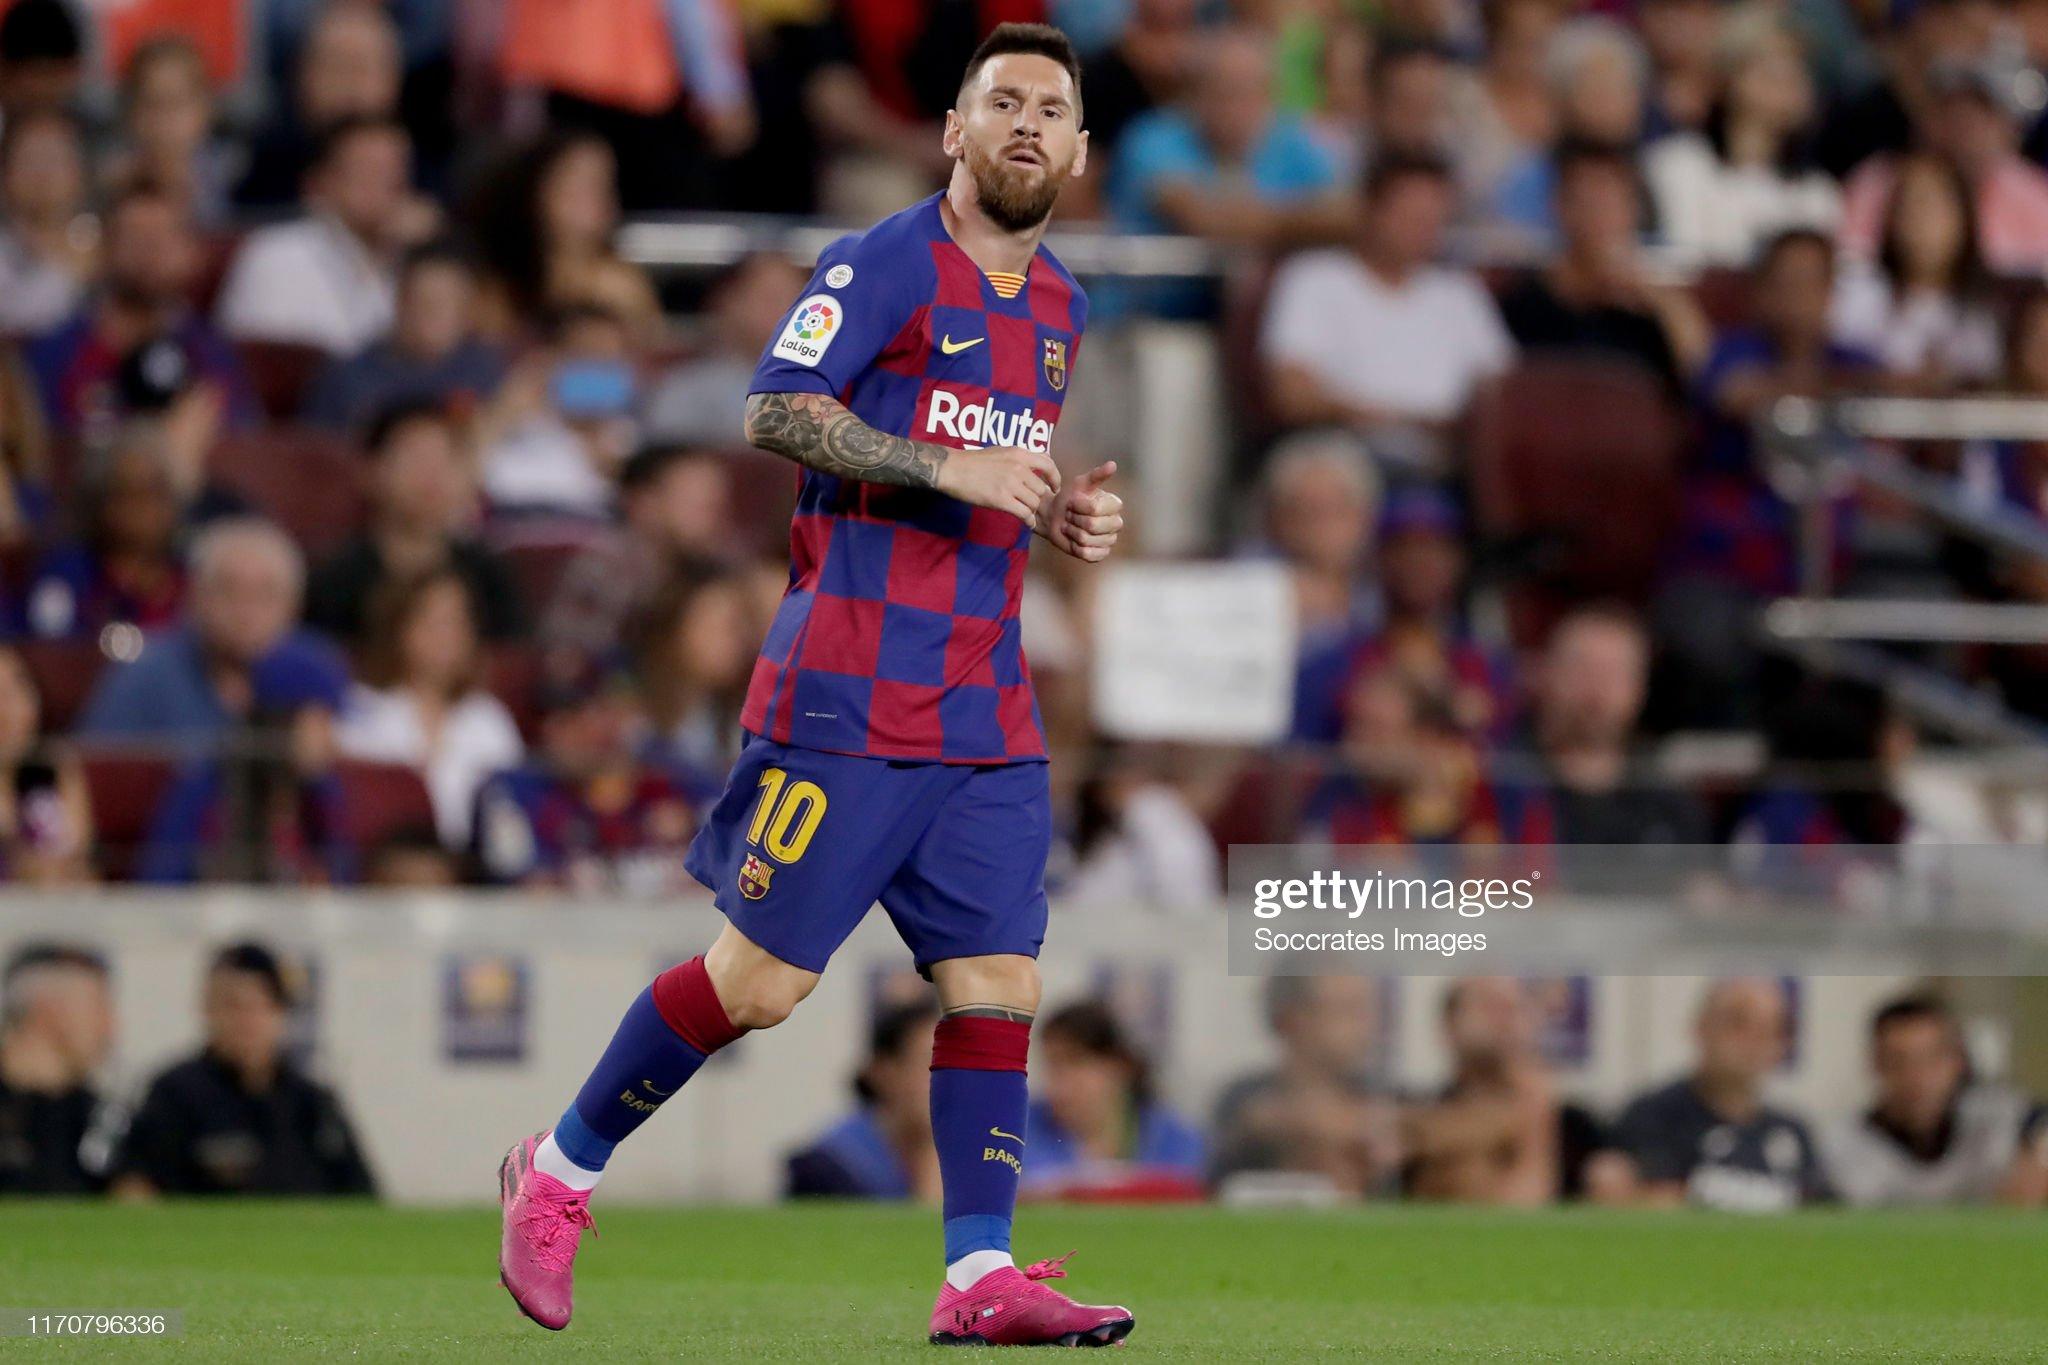 صور مباراة : برشلونة - فياريال 2-1 ( 24-09-2019 )  Lionel-messi-of-fc-barcelona-during-the-la-liga-santander-match-fc-picture-id1170796336?s=2048x2048